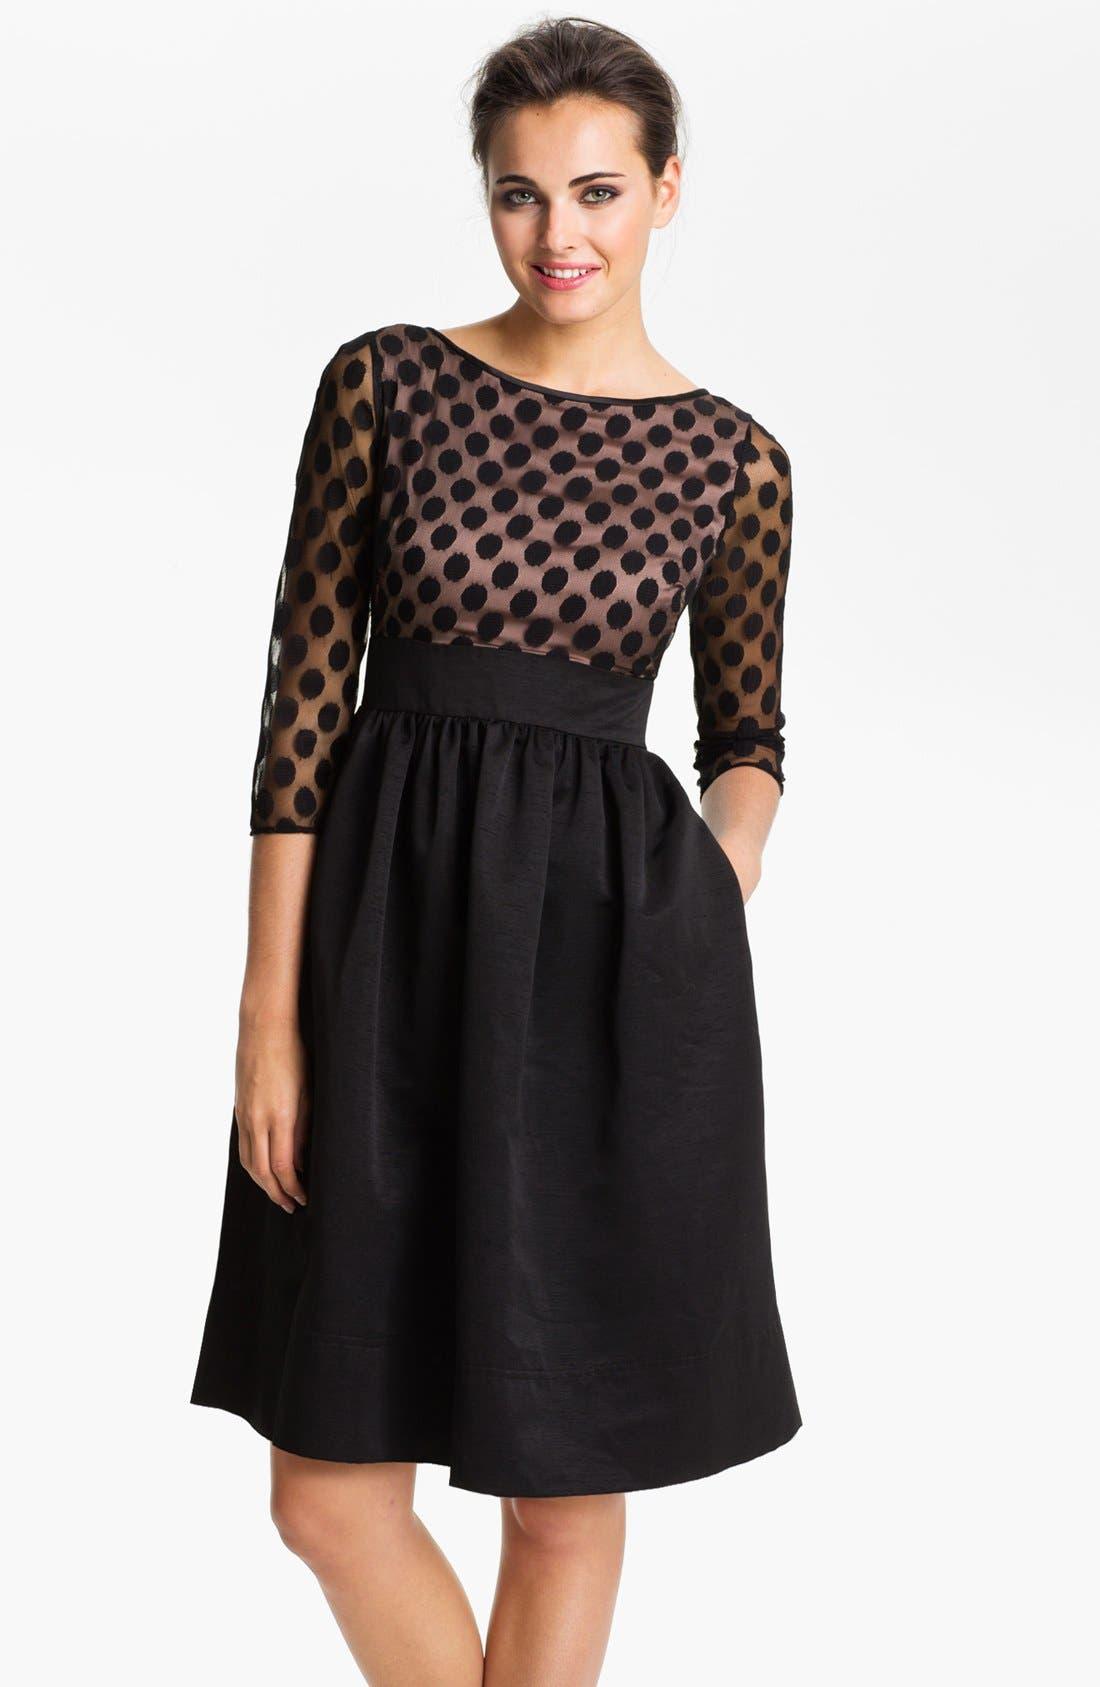 Alternate Image 1 Selected - Eliza J Dot Mesh Bodice Fit & Flare Dress (Regular & Petite)